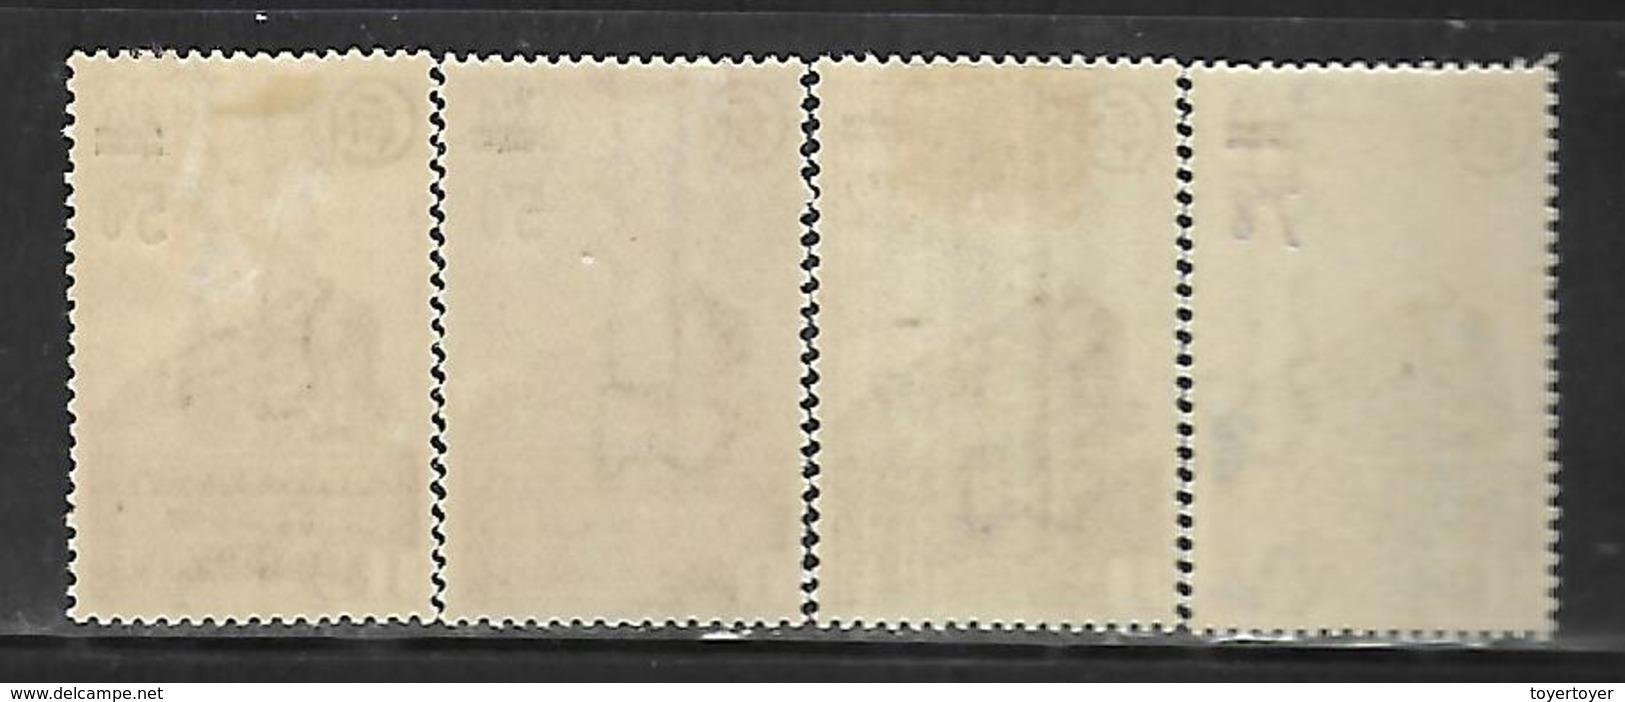 Fg167  France Colis Postaux N°226A(2 Nuances)-227A-228A Nx - Neufs